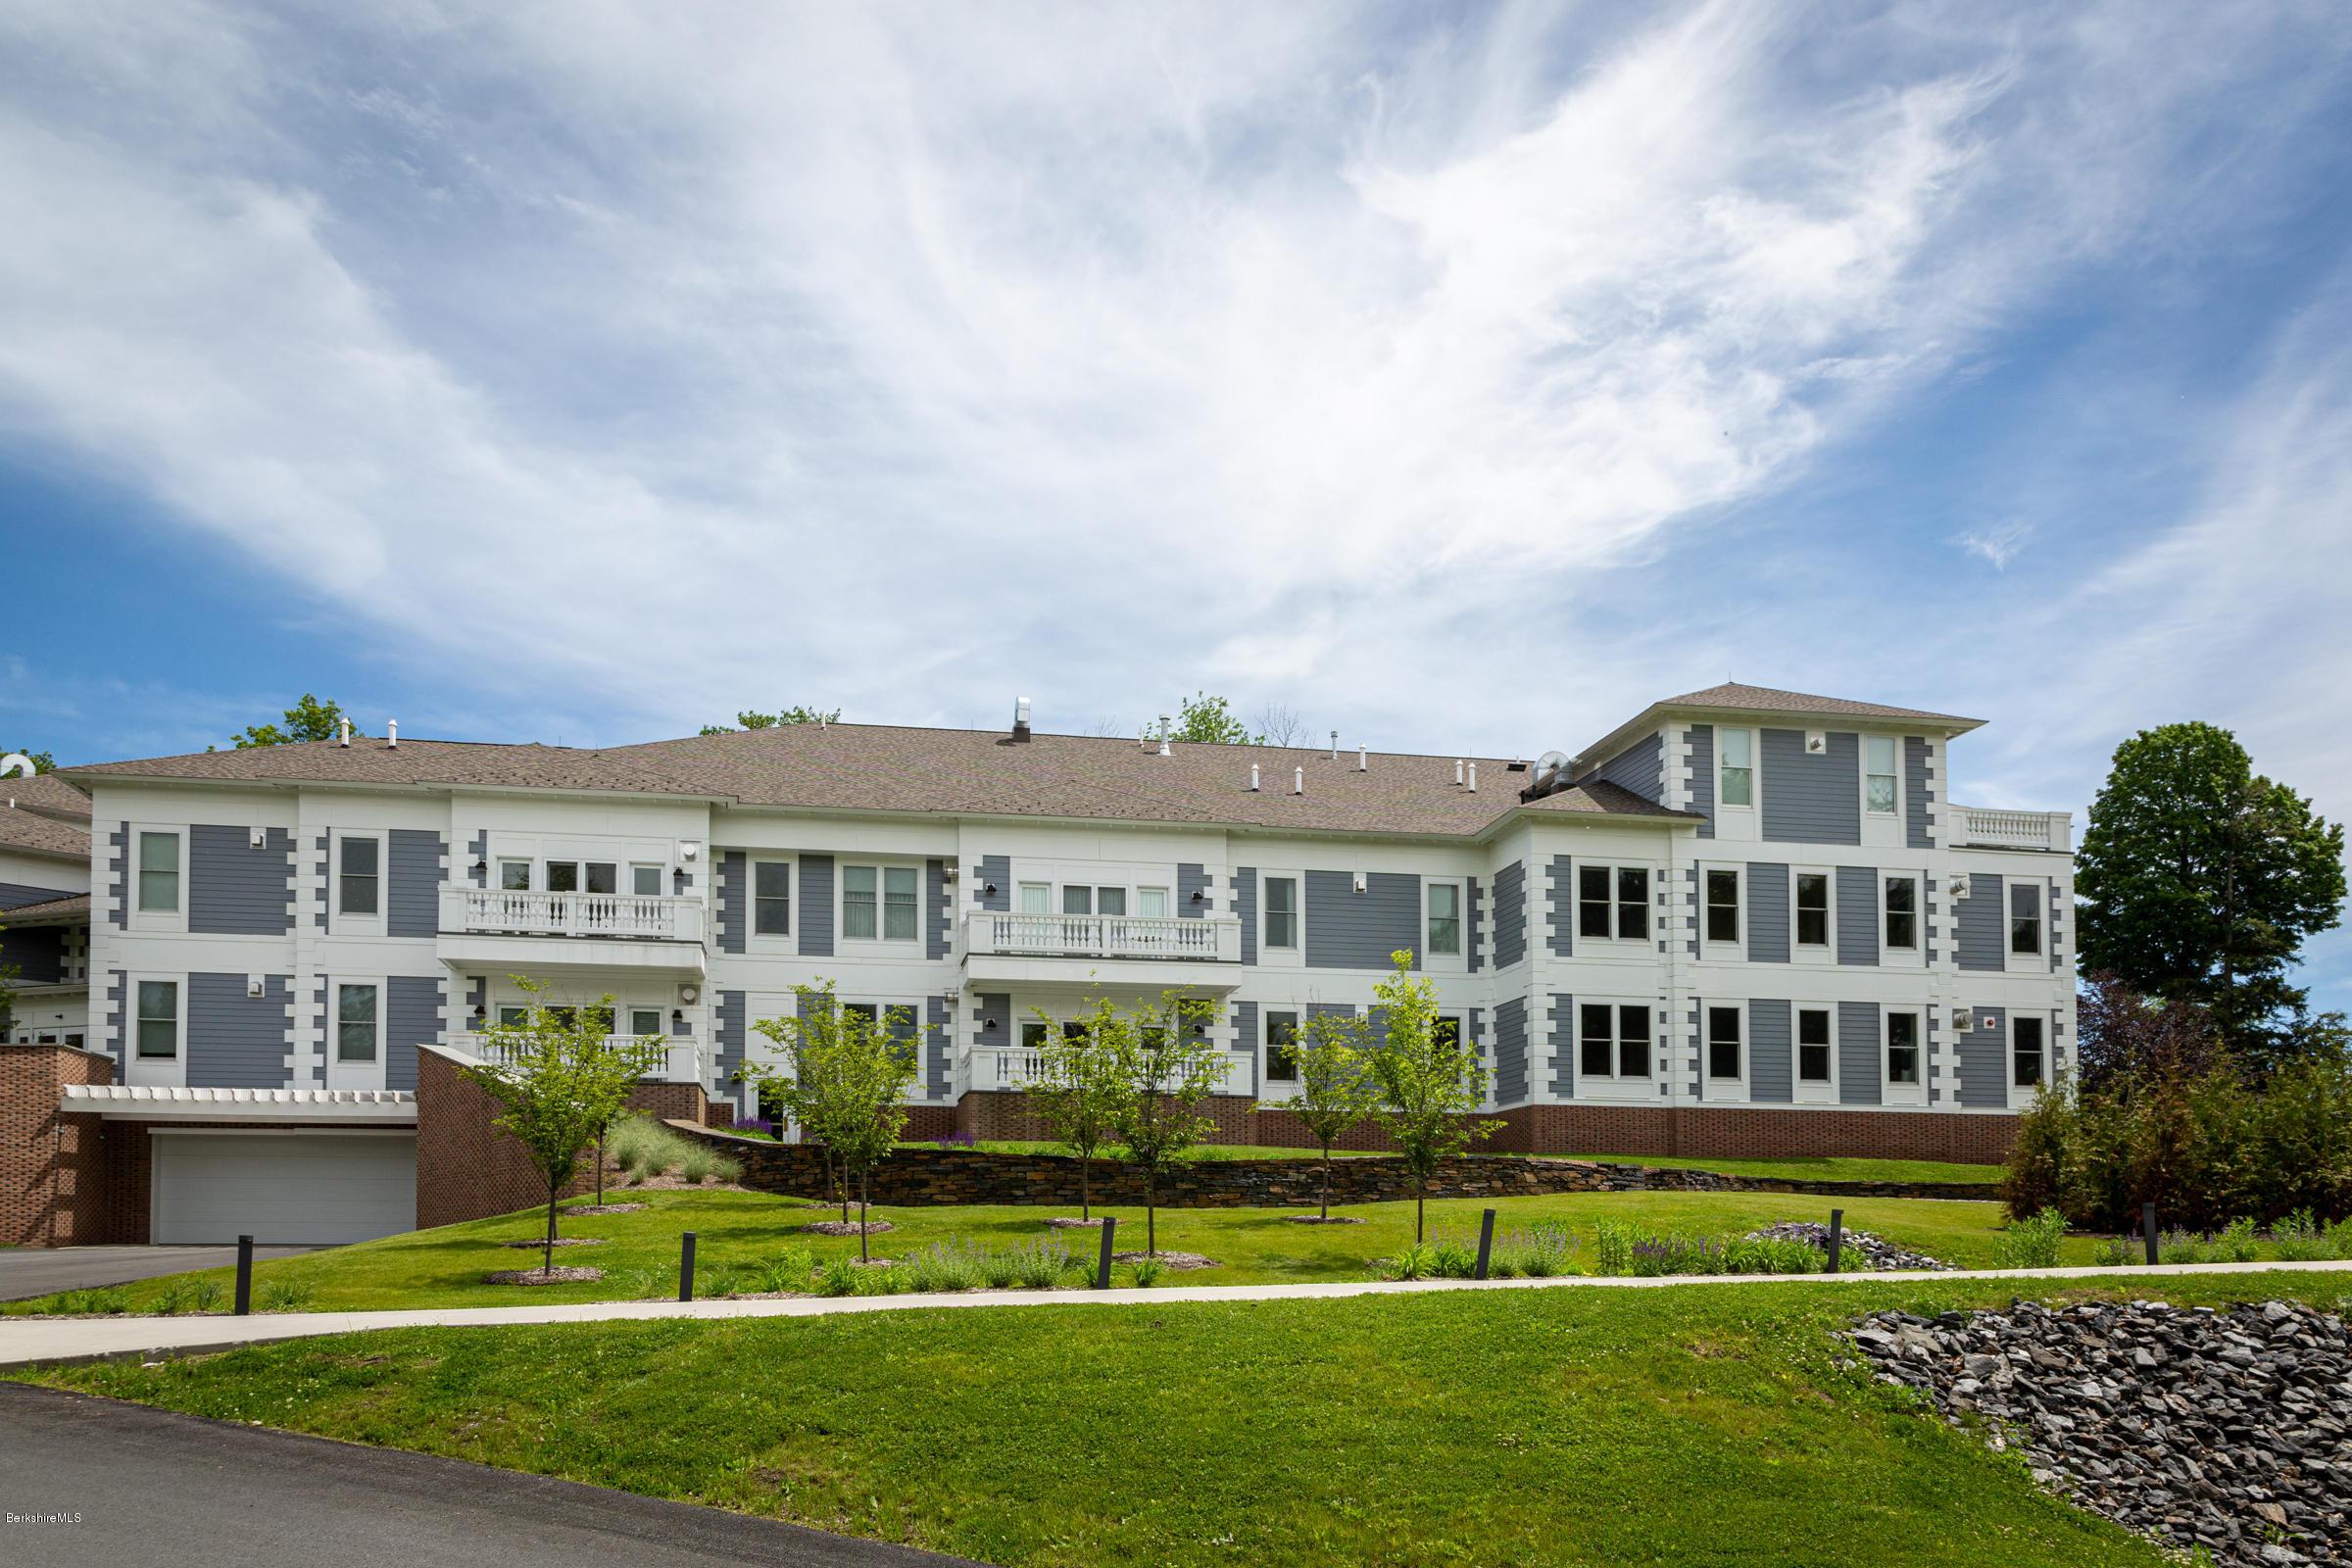 165 Kemble, Lenox, Massachusetts 01240, 1 Bedroom Bedrooms, 5 Rooms Rooms,2 BathroomsBathrooms,Condominium,For Sale,Kemble,232125